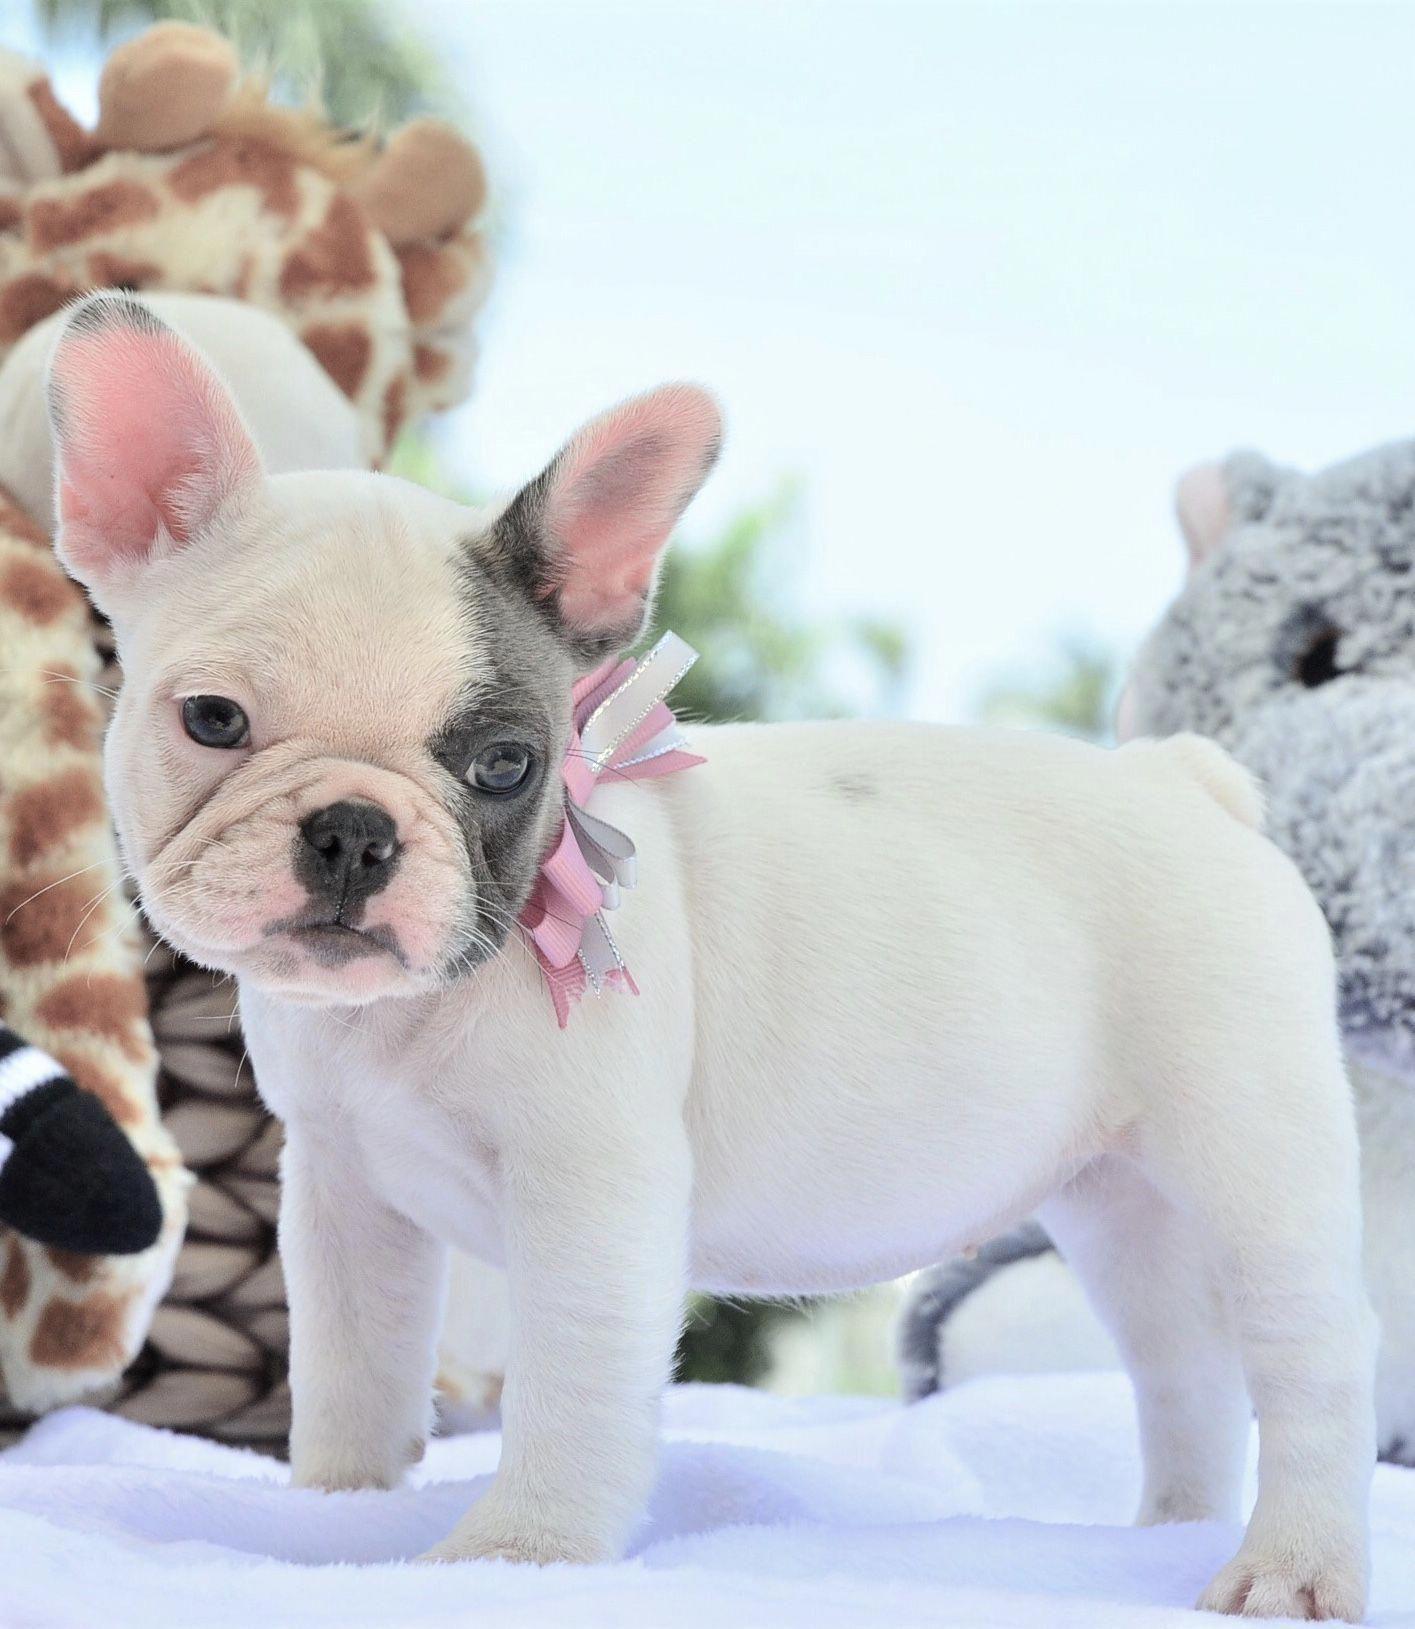 French Bulldog Playful And Smart French Bulldog Puppies Bulldog Puppies Cute Animals